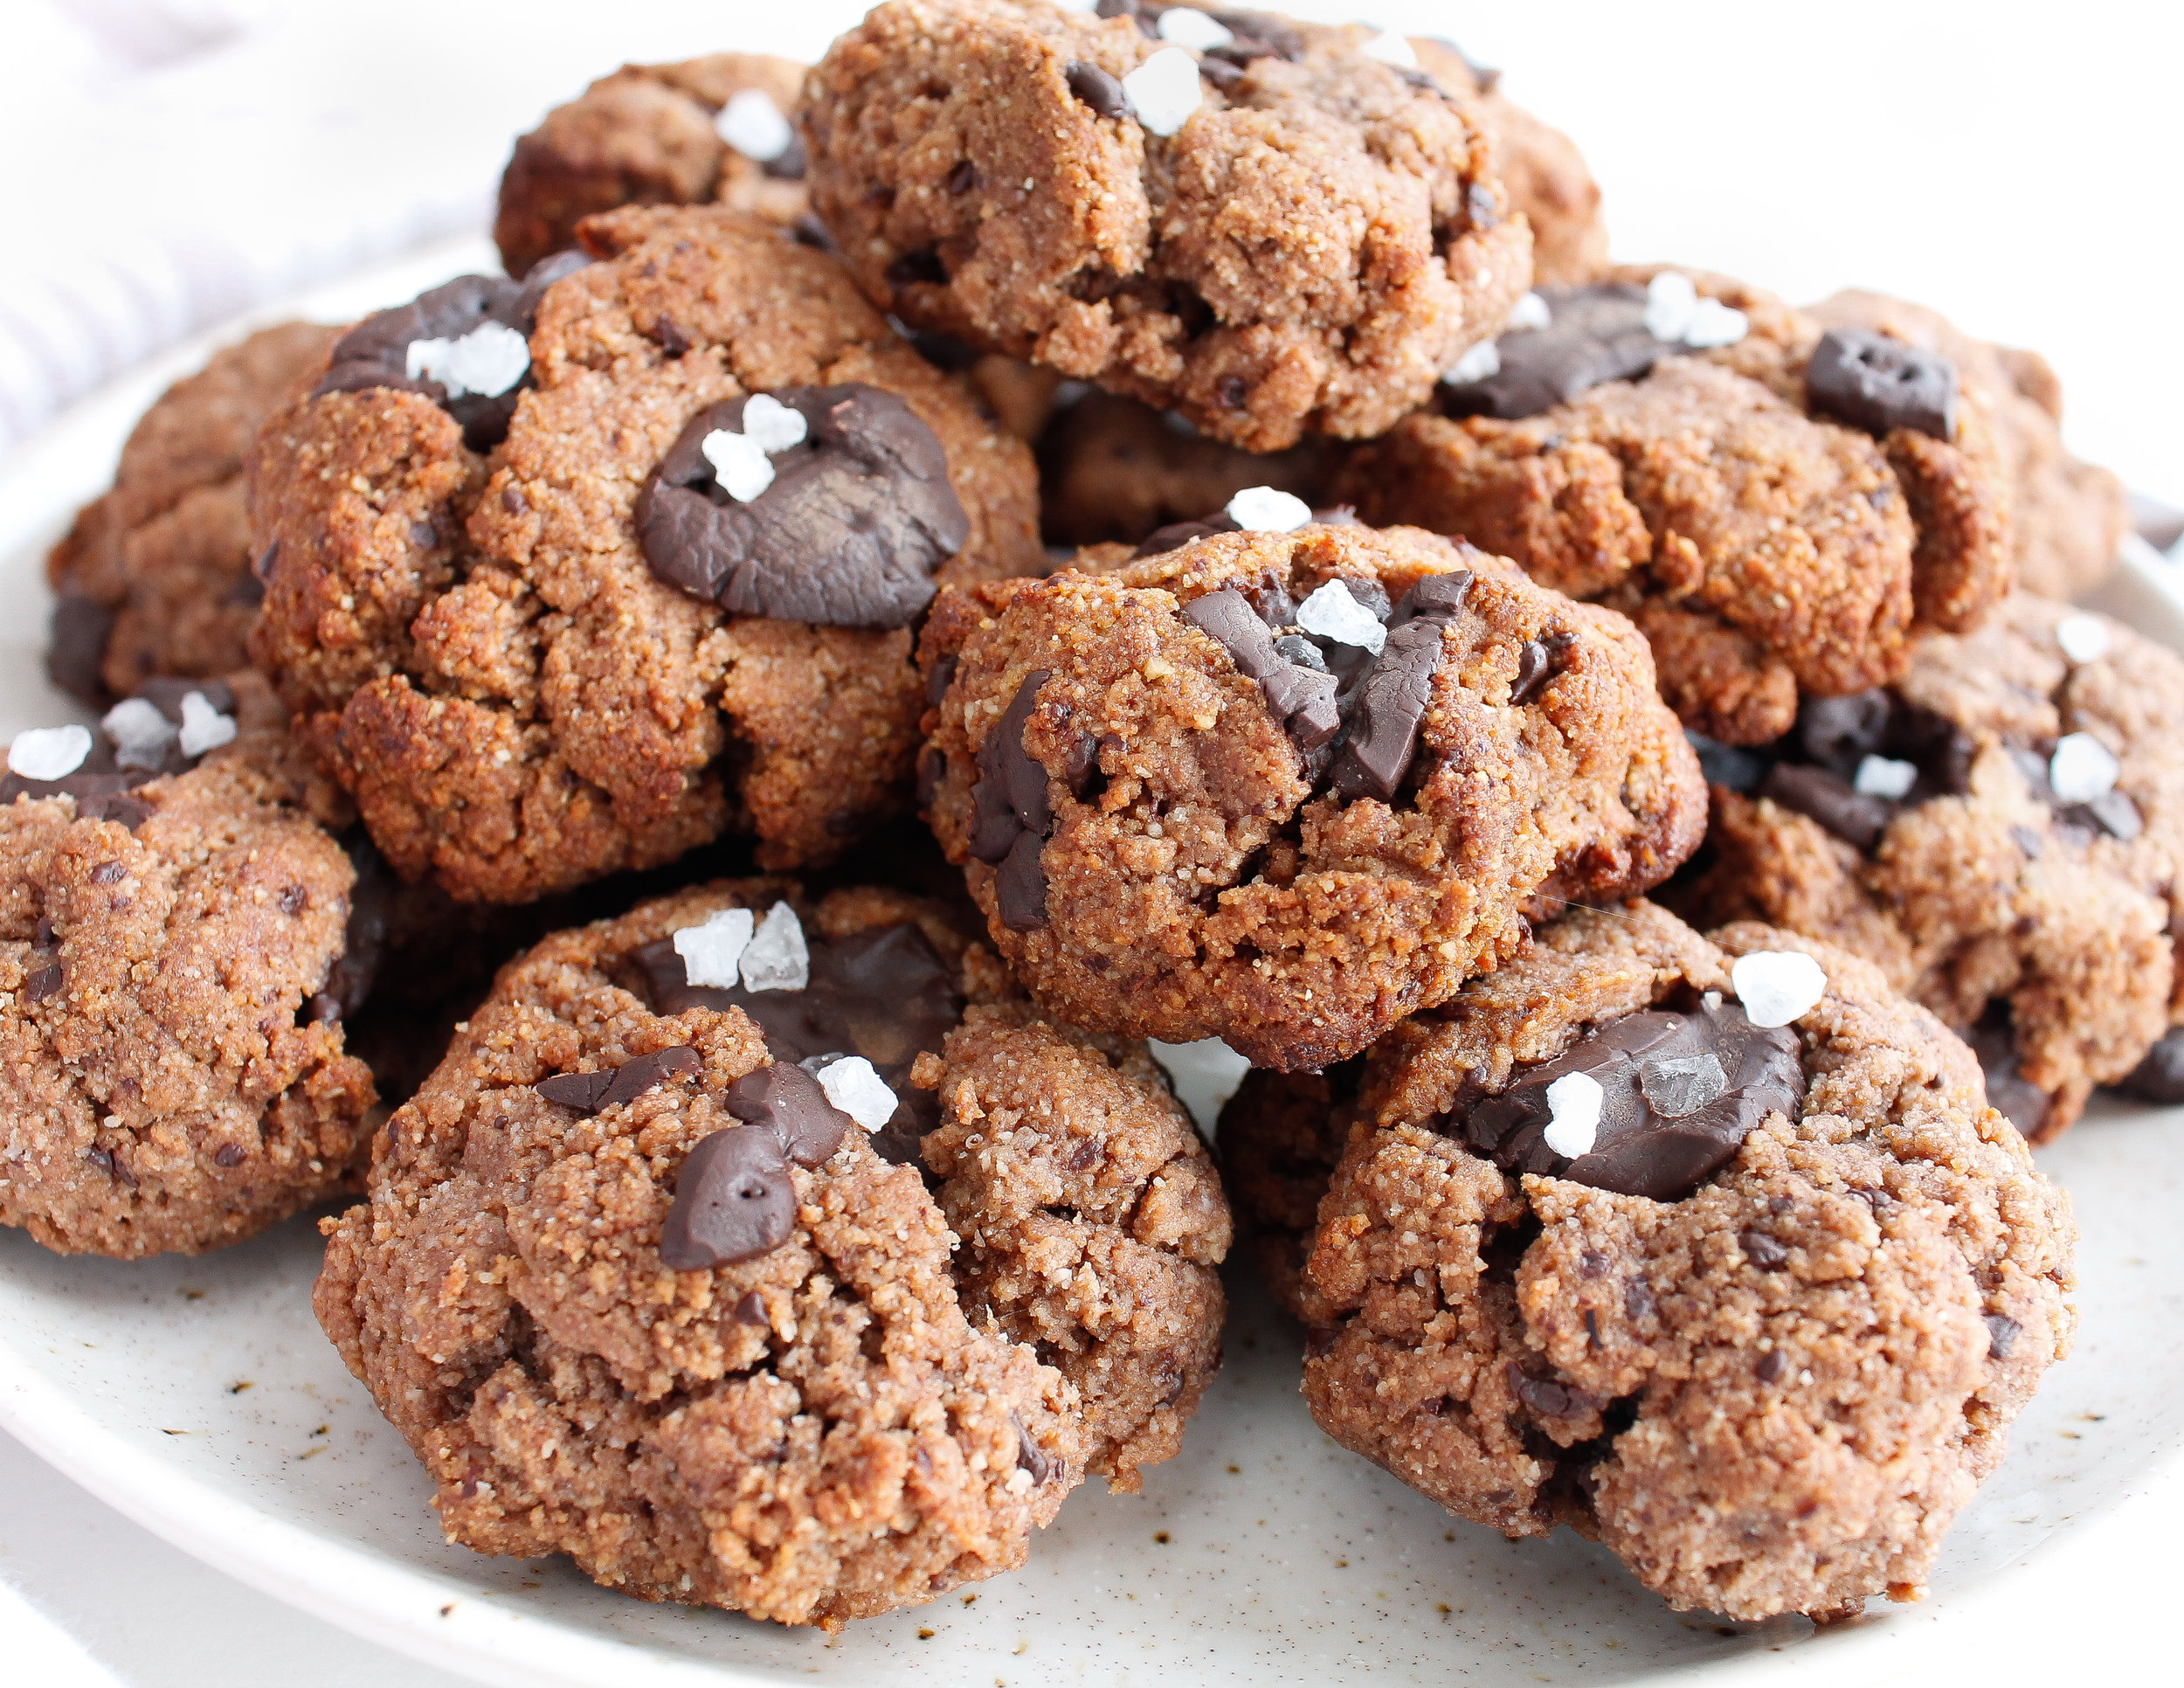 PALEO SALTED CHOCOLATE TAHINI COOKIES